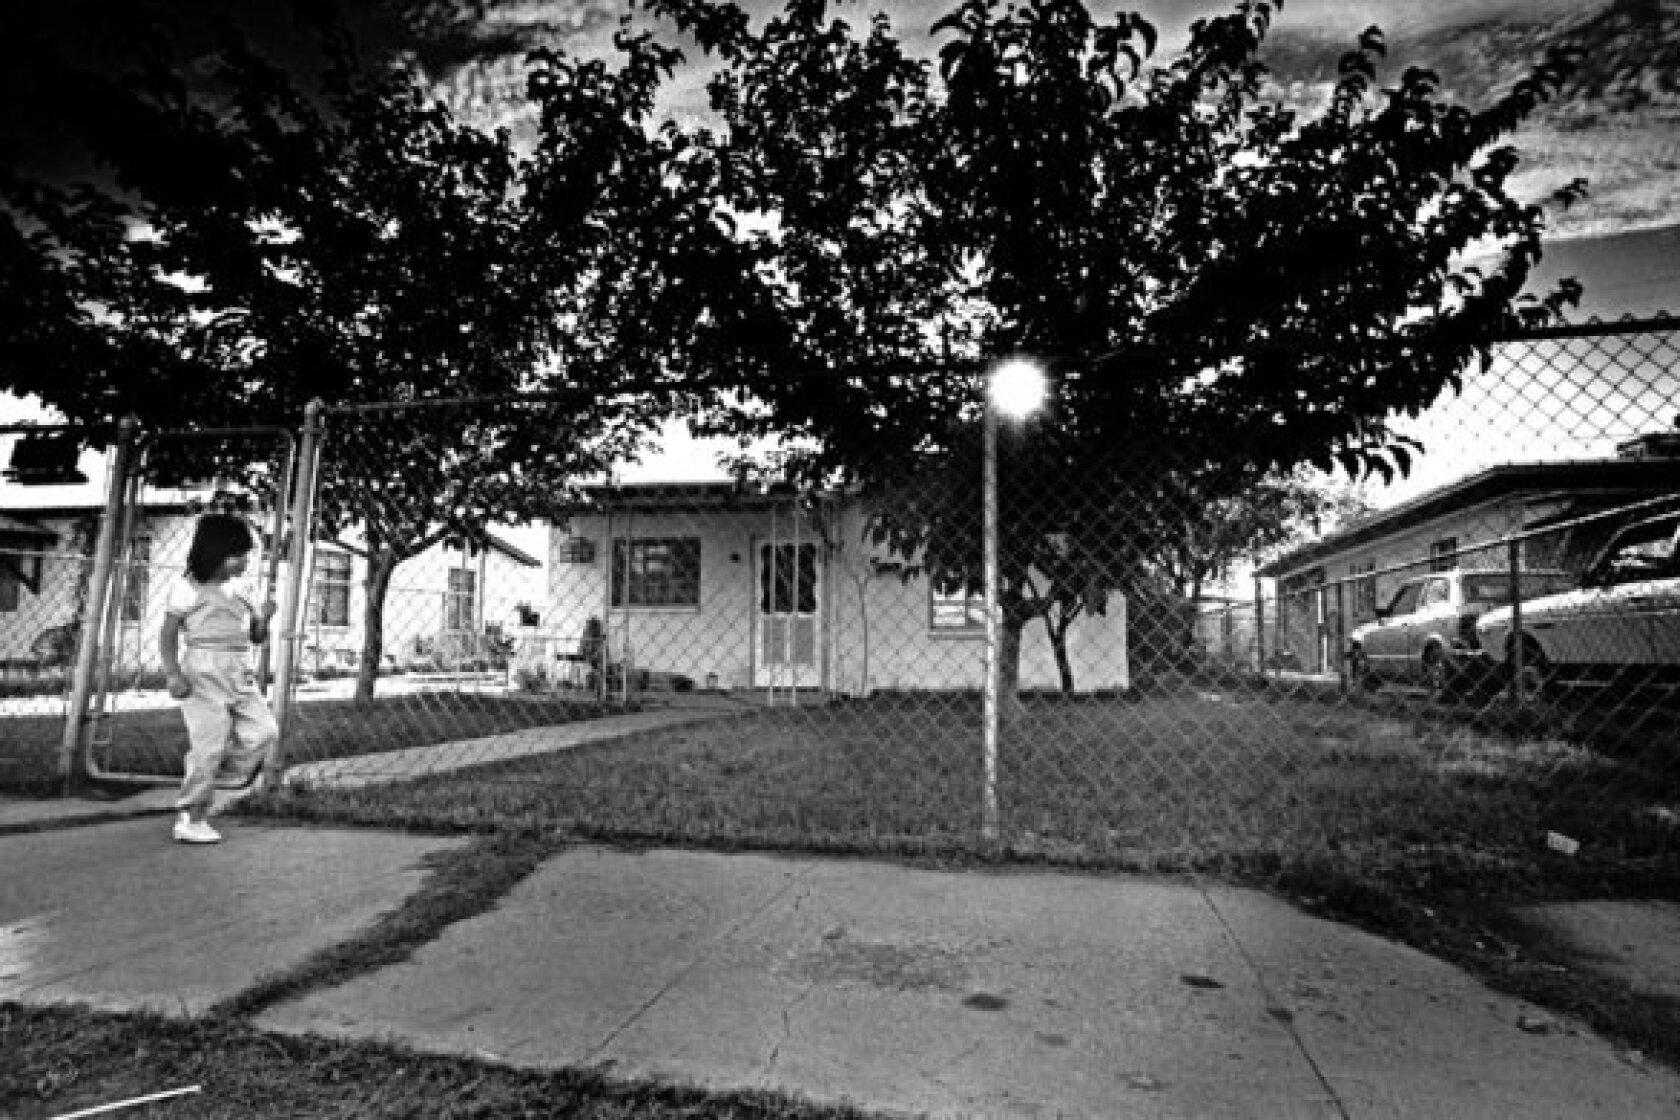 Night Stalker' Richard Ramirez dead of natural causes - Los